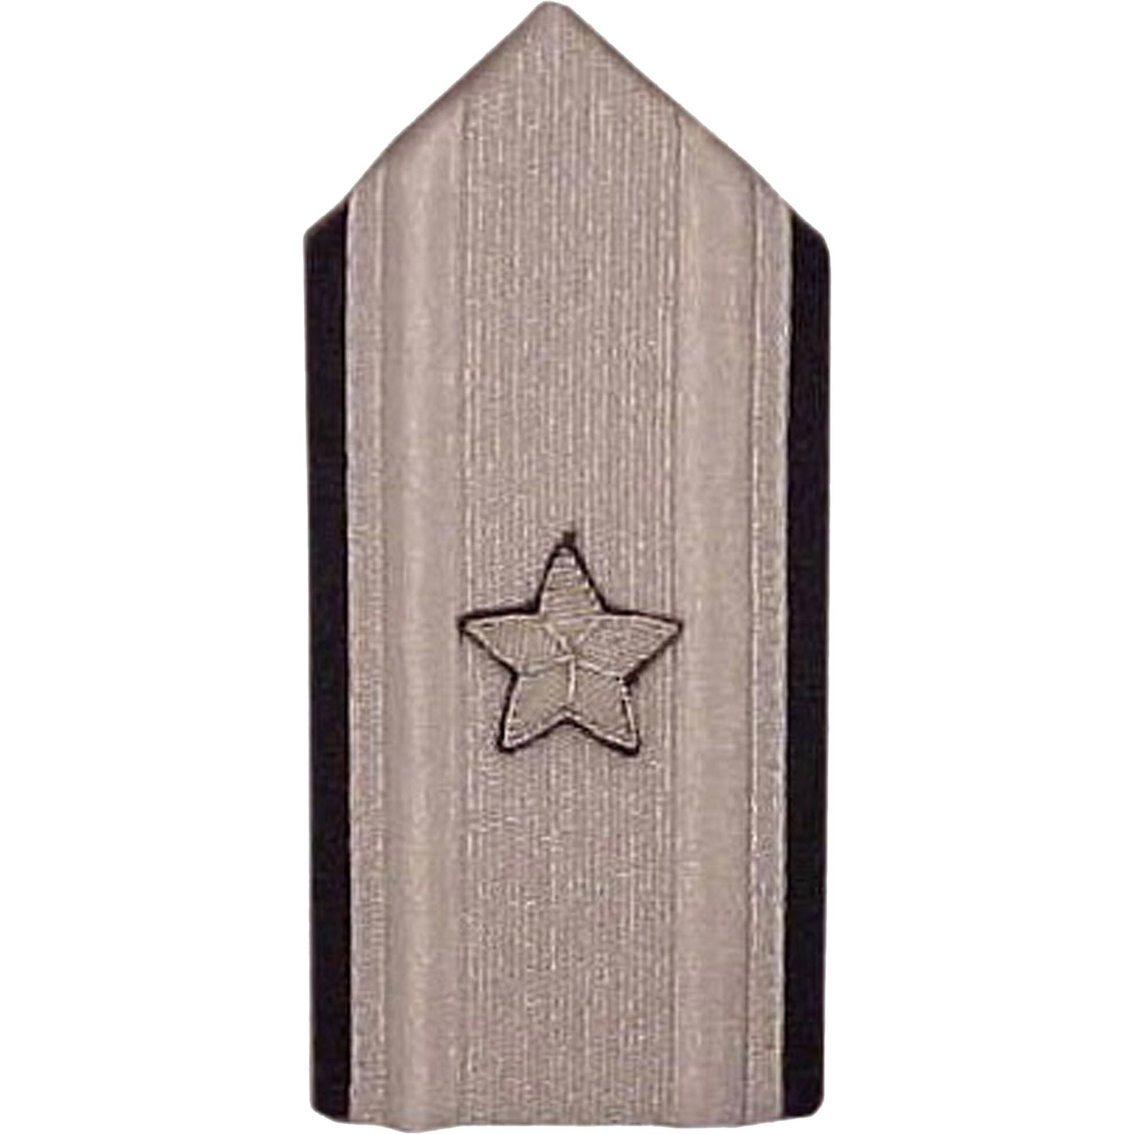 Air Force Shoulder Board Dress Briga R General Female